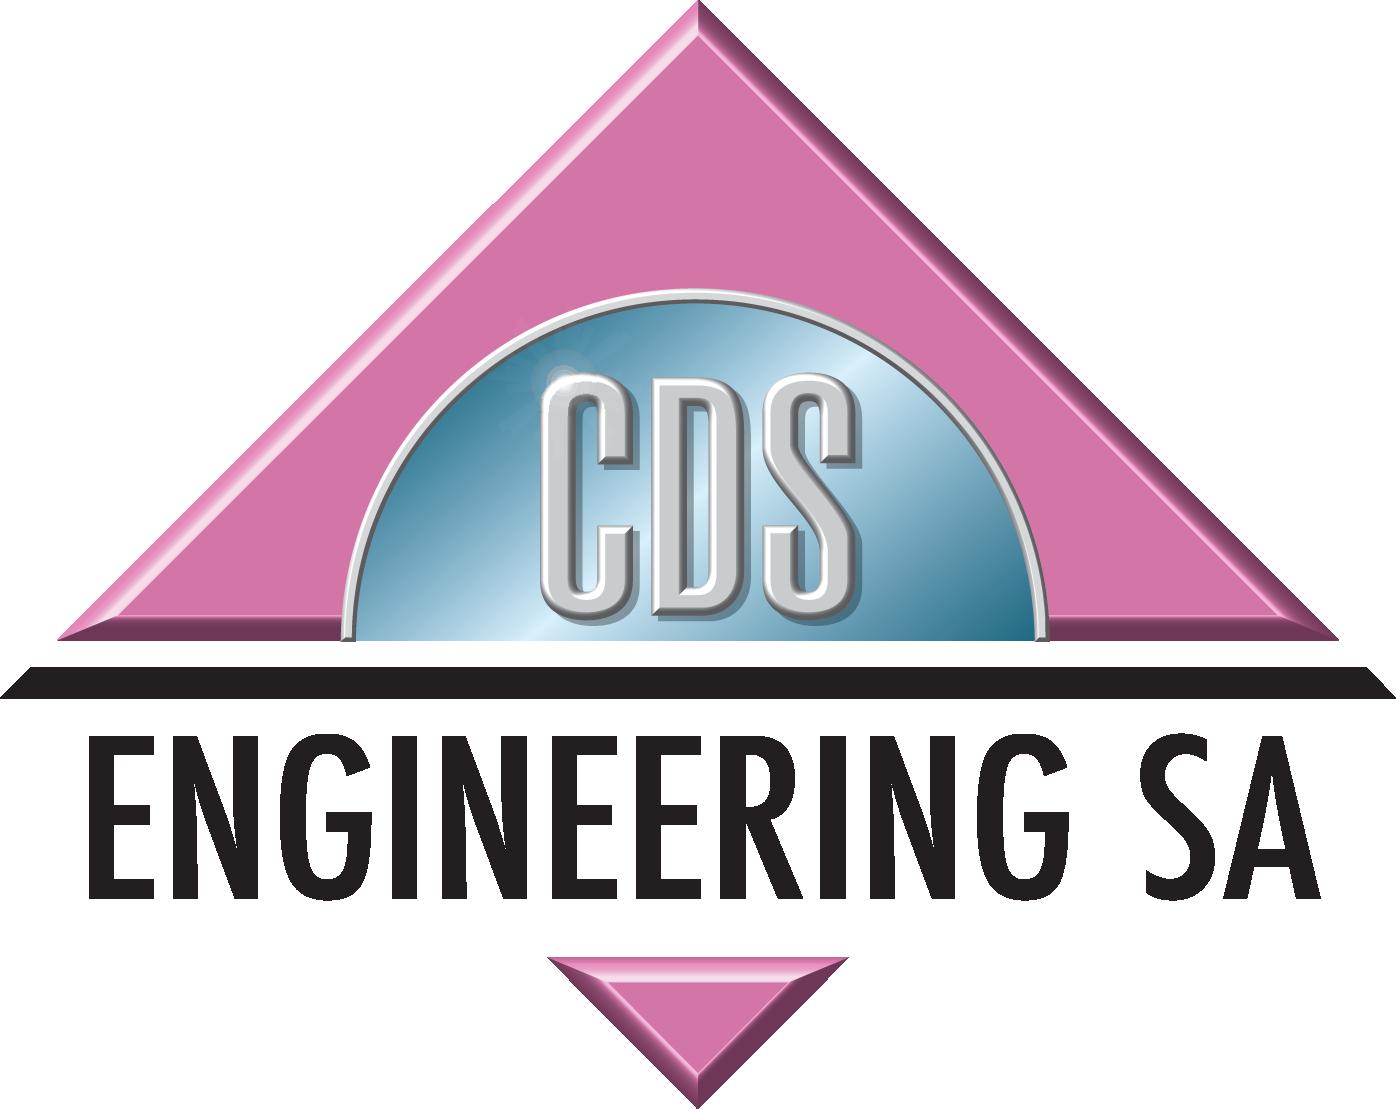 CDS Engineering SA